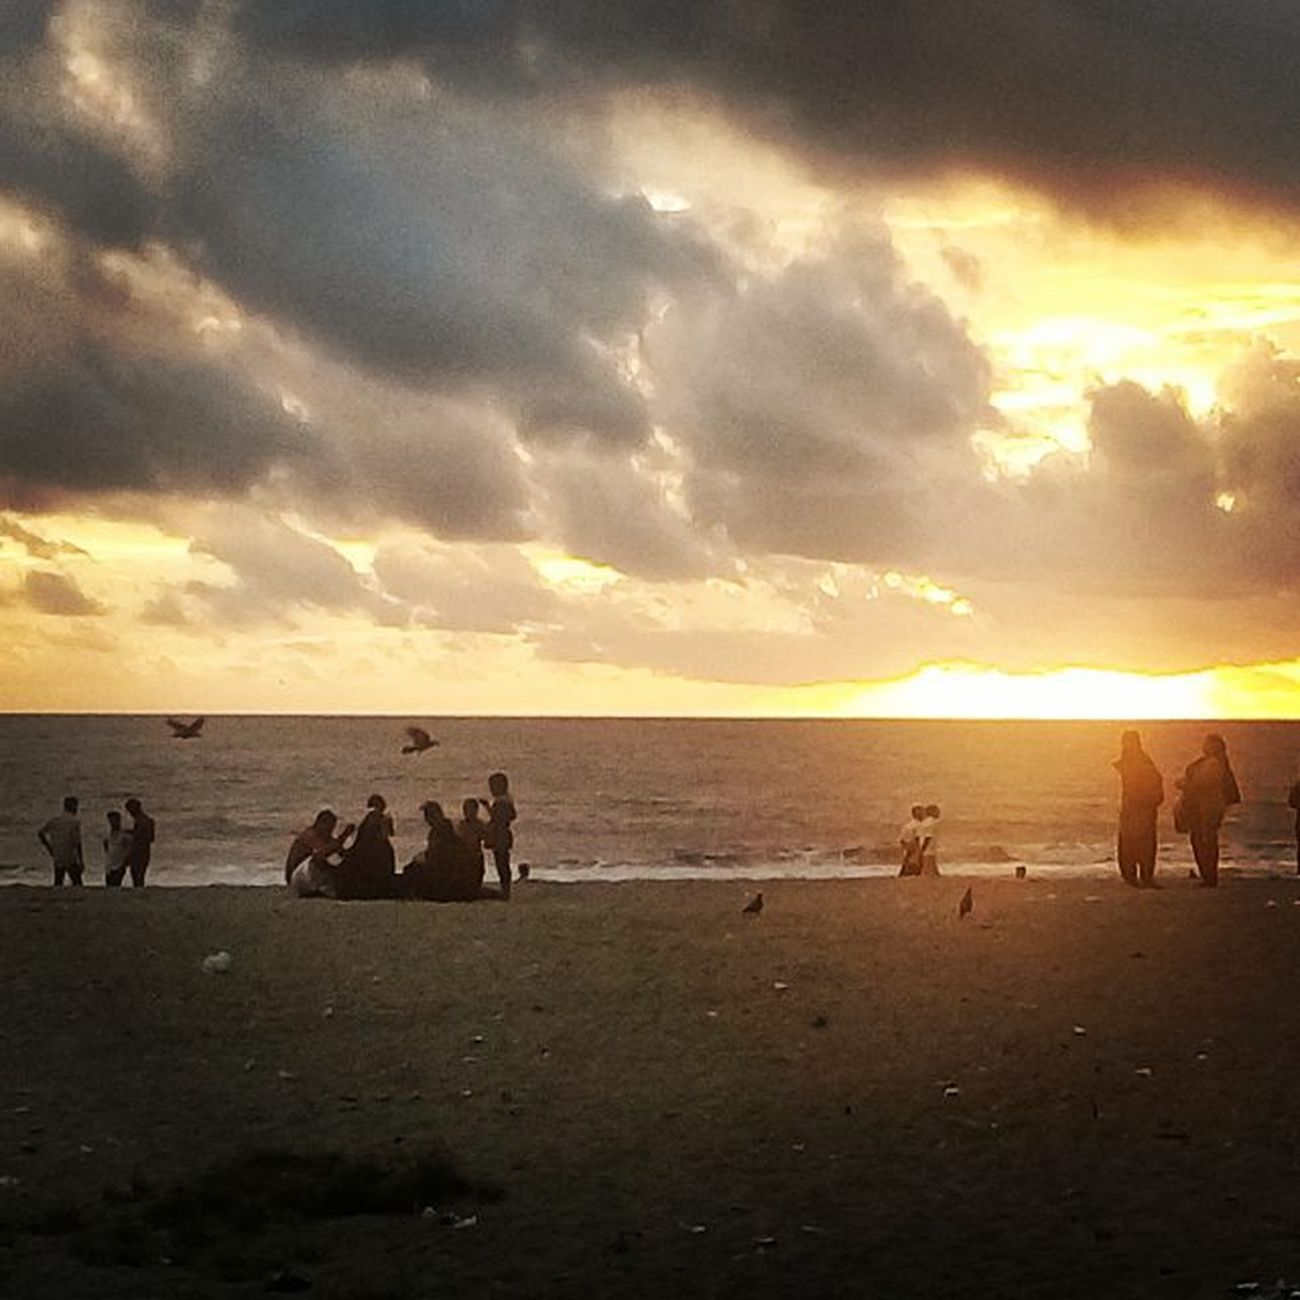 Sea Seaandsun Birds Random People Instagram Sunsets Clouds Evening Eveningwalk Kerala Kozhikode Vscogood Awesome Instacam